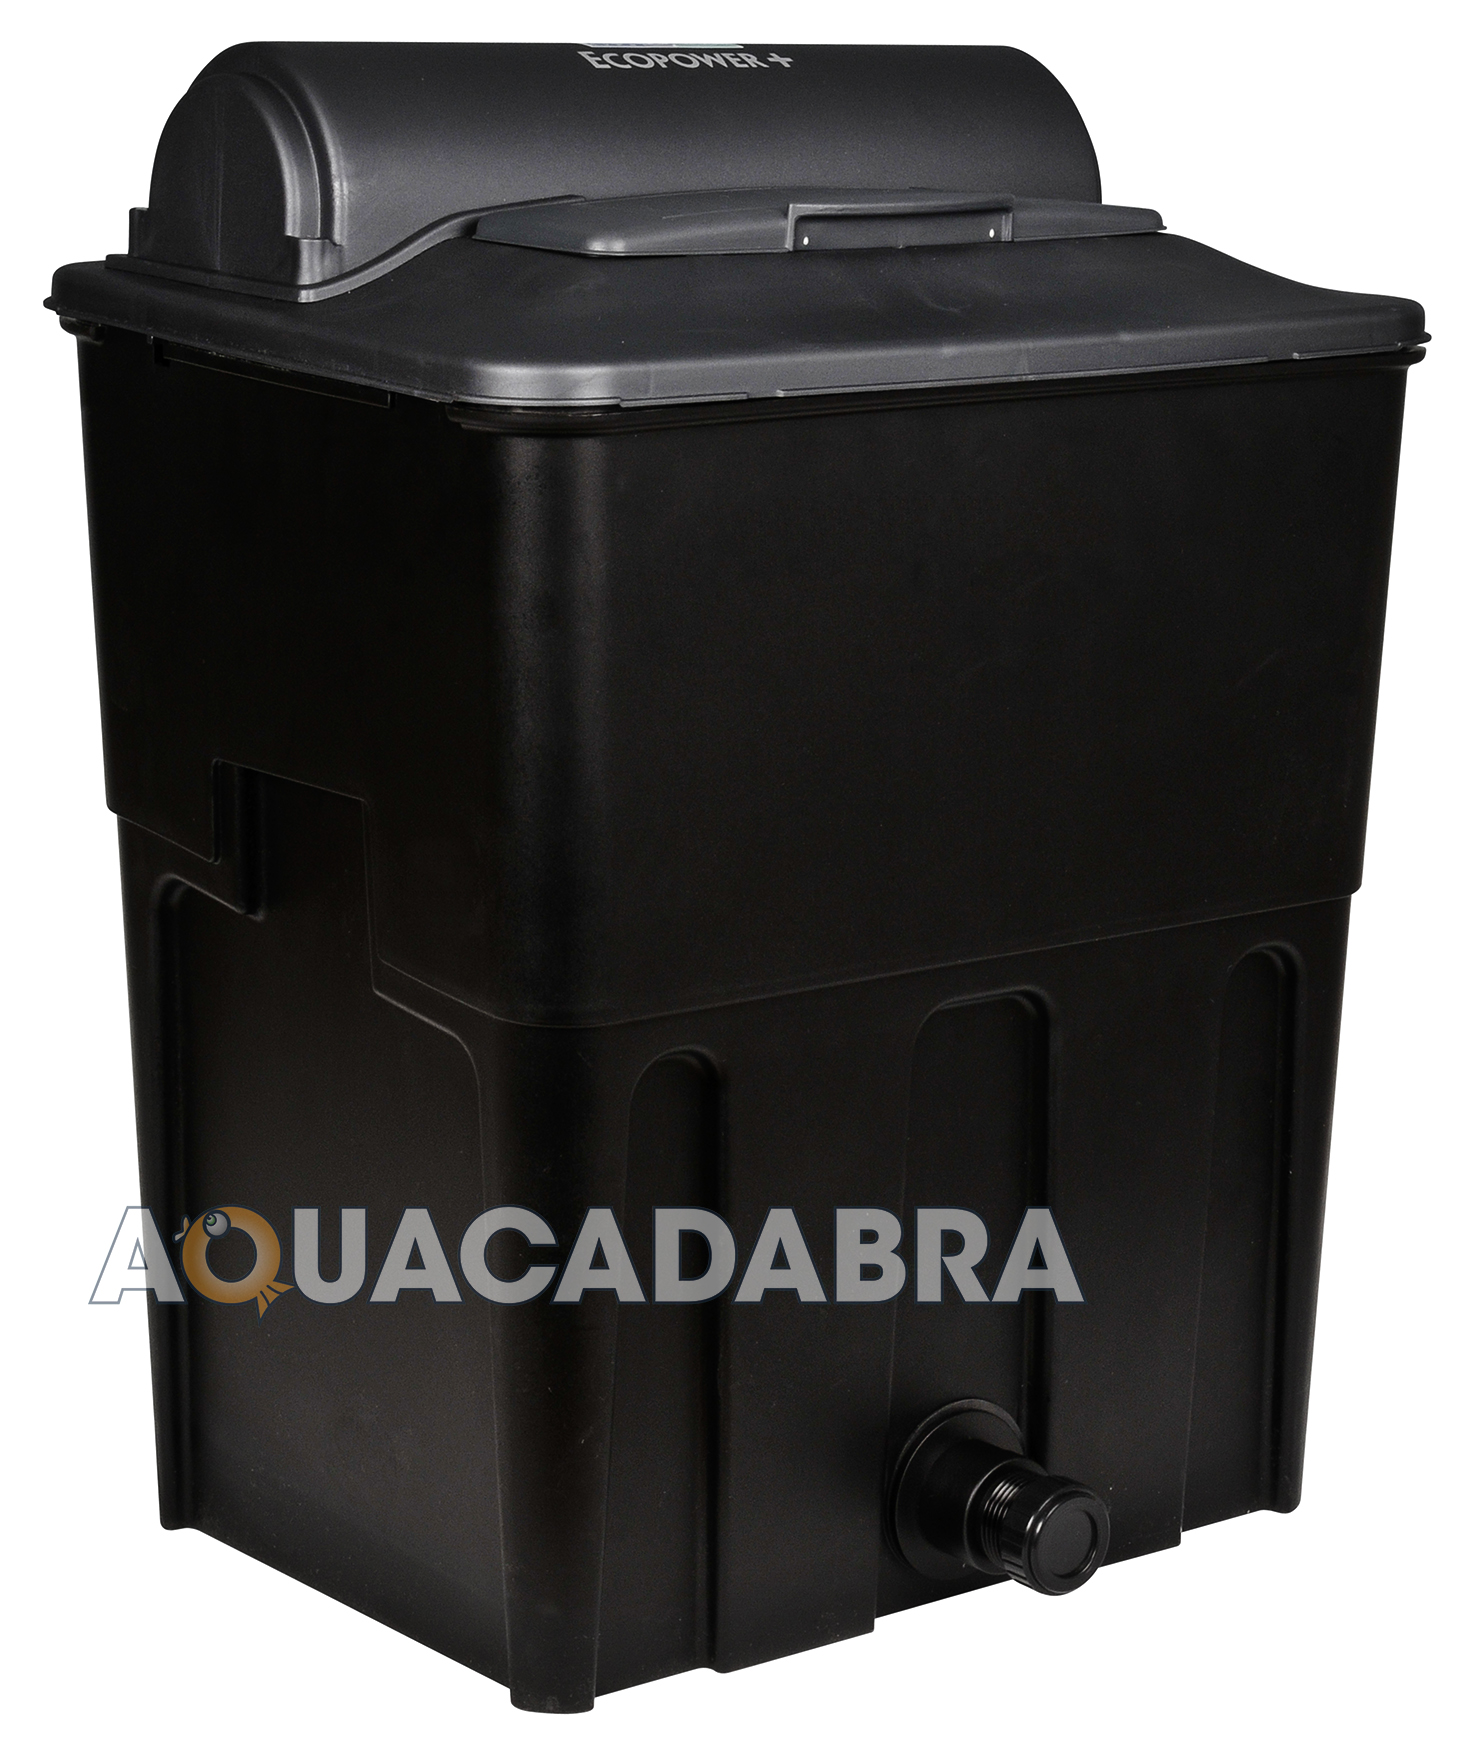 hozelock ecopower pond filter uv uvc water filtration gravity koi fish garden ebay. Black Bedroom Furniture Sets. Home Design Ideas